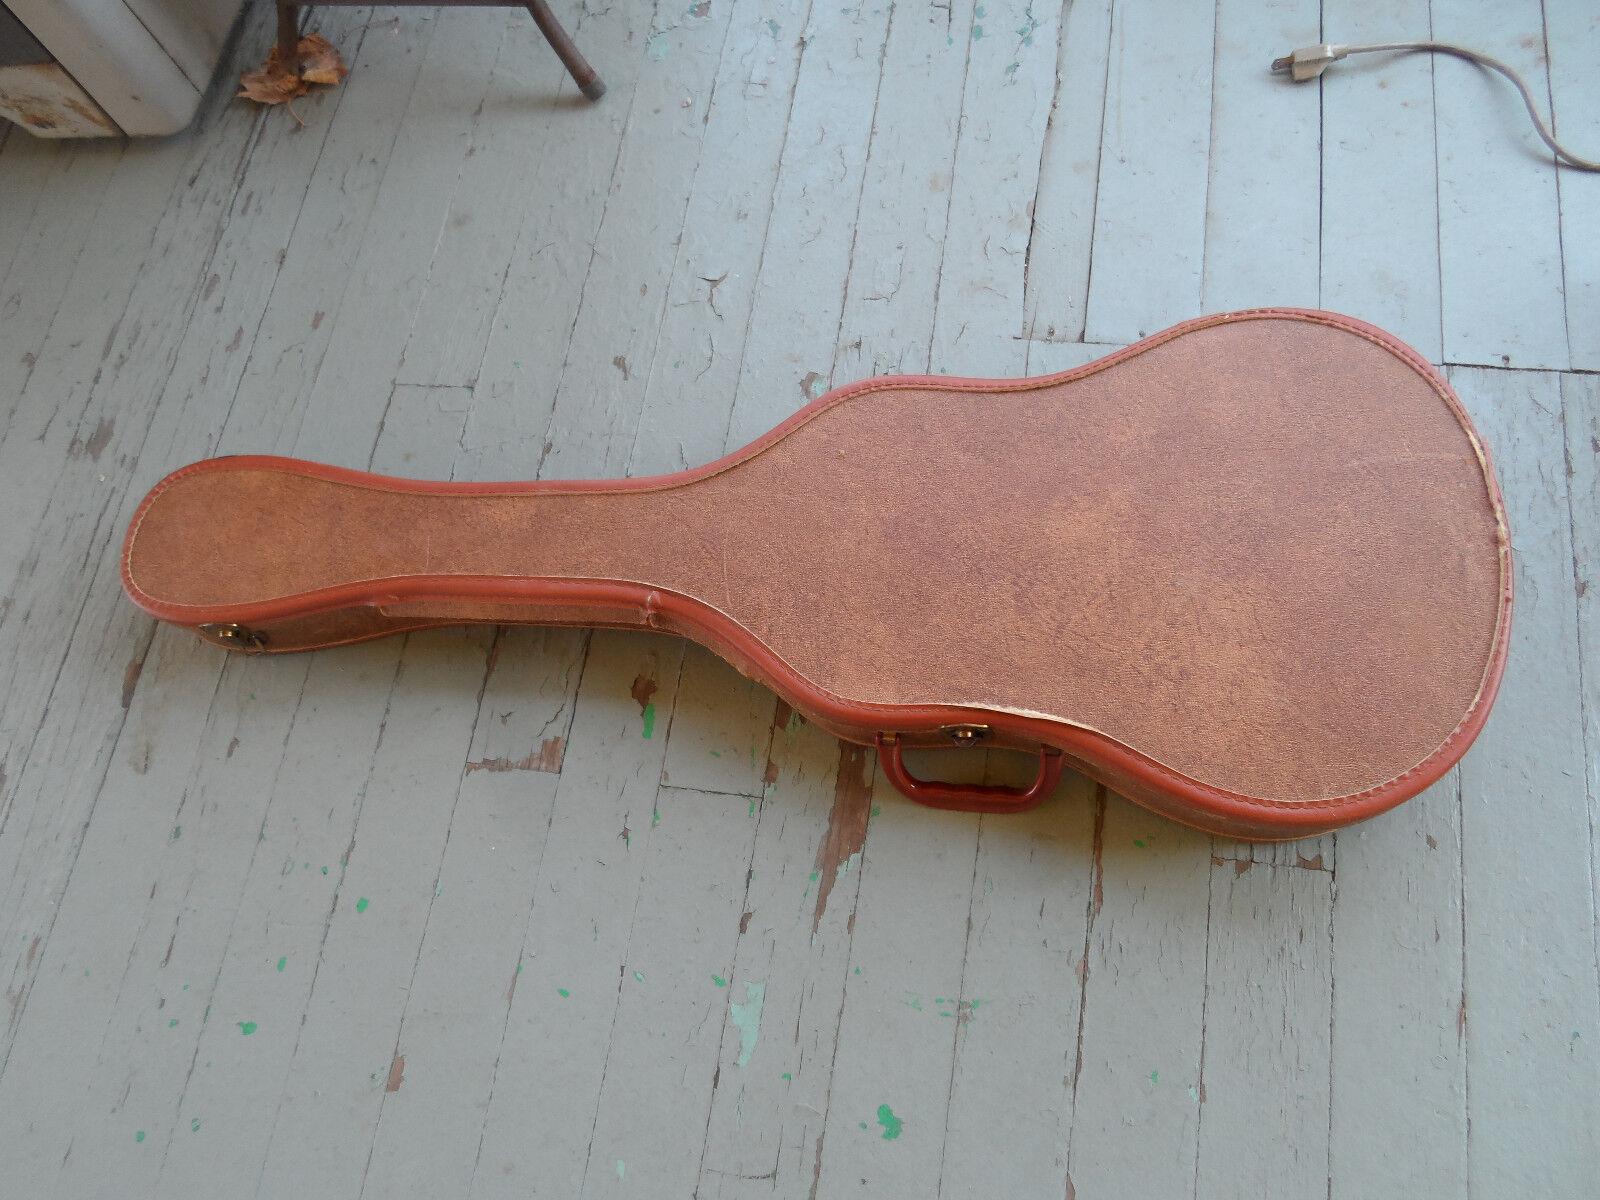 Vintage 1960s 1960s 1960s Gibson Melody Maker Chipboard Original Guitar Case 52e944